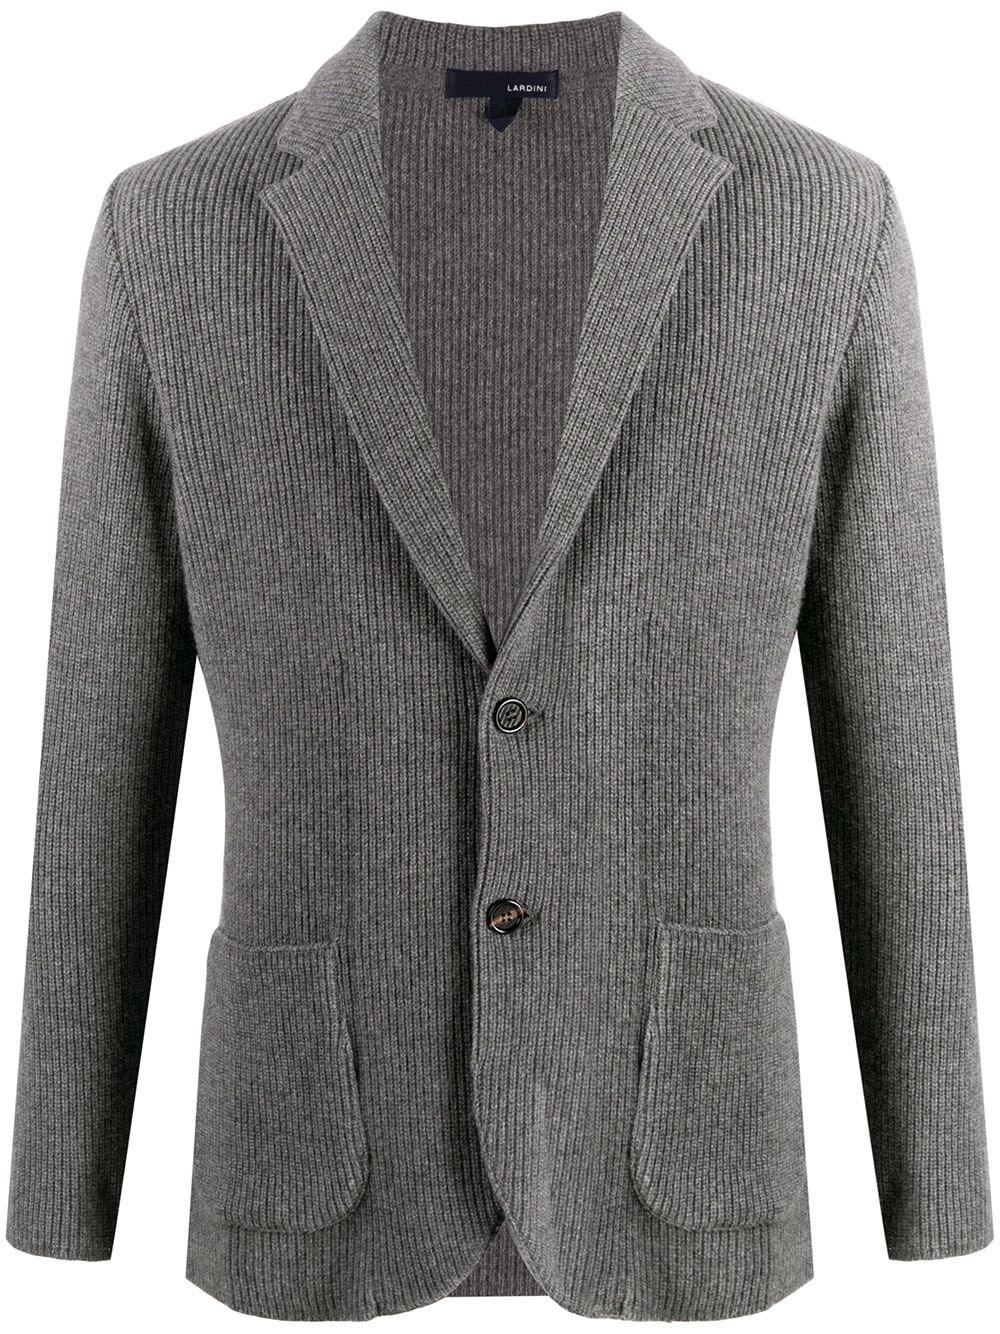 LARDINI Fitted Knit Jacket